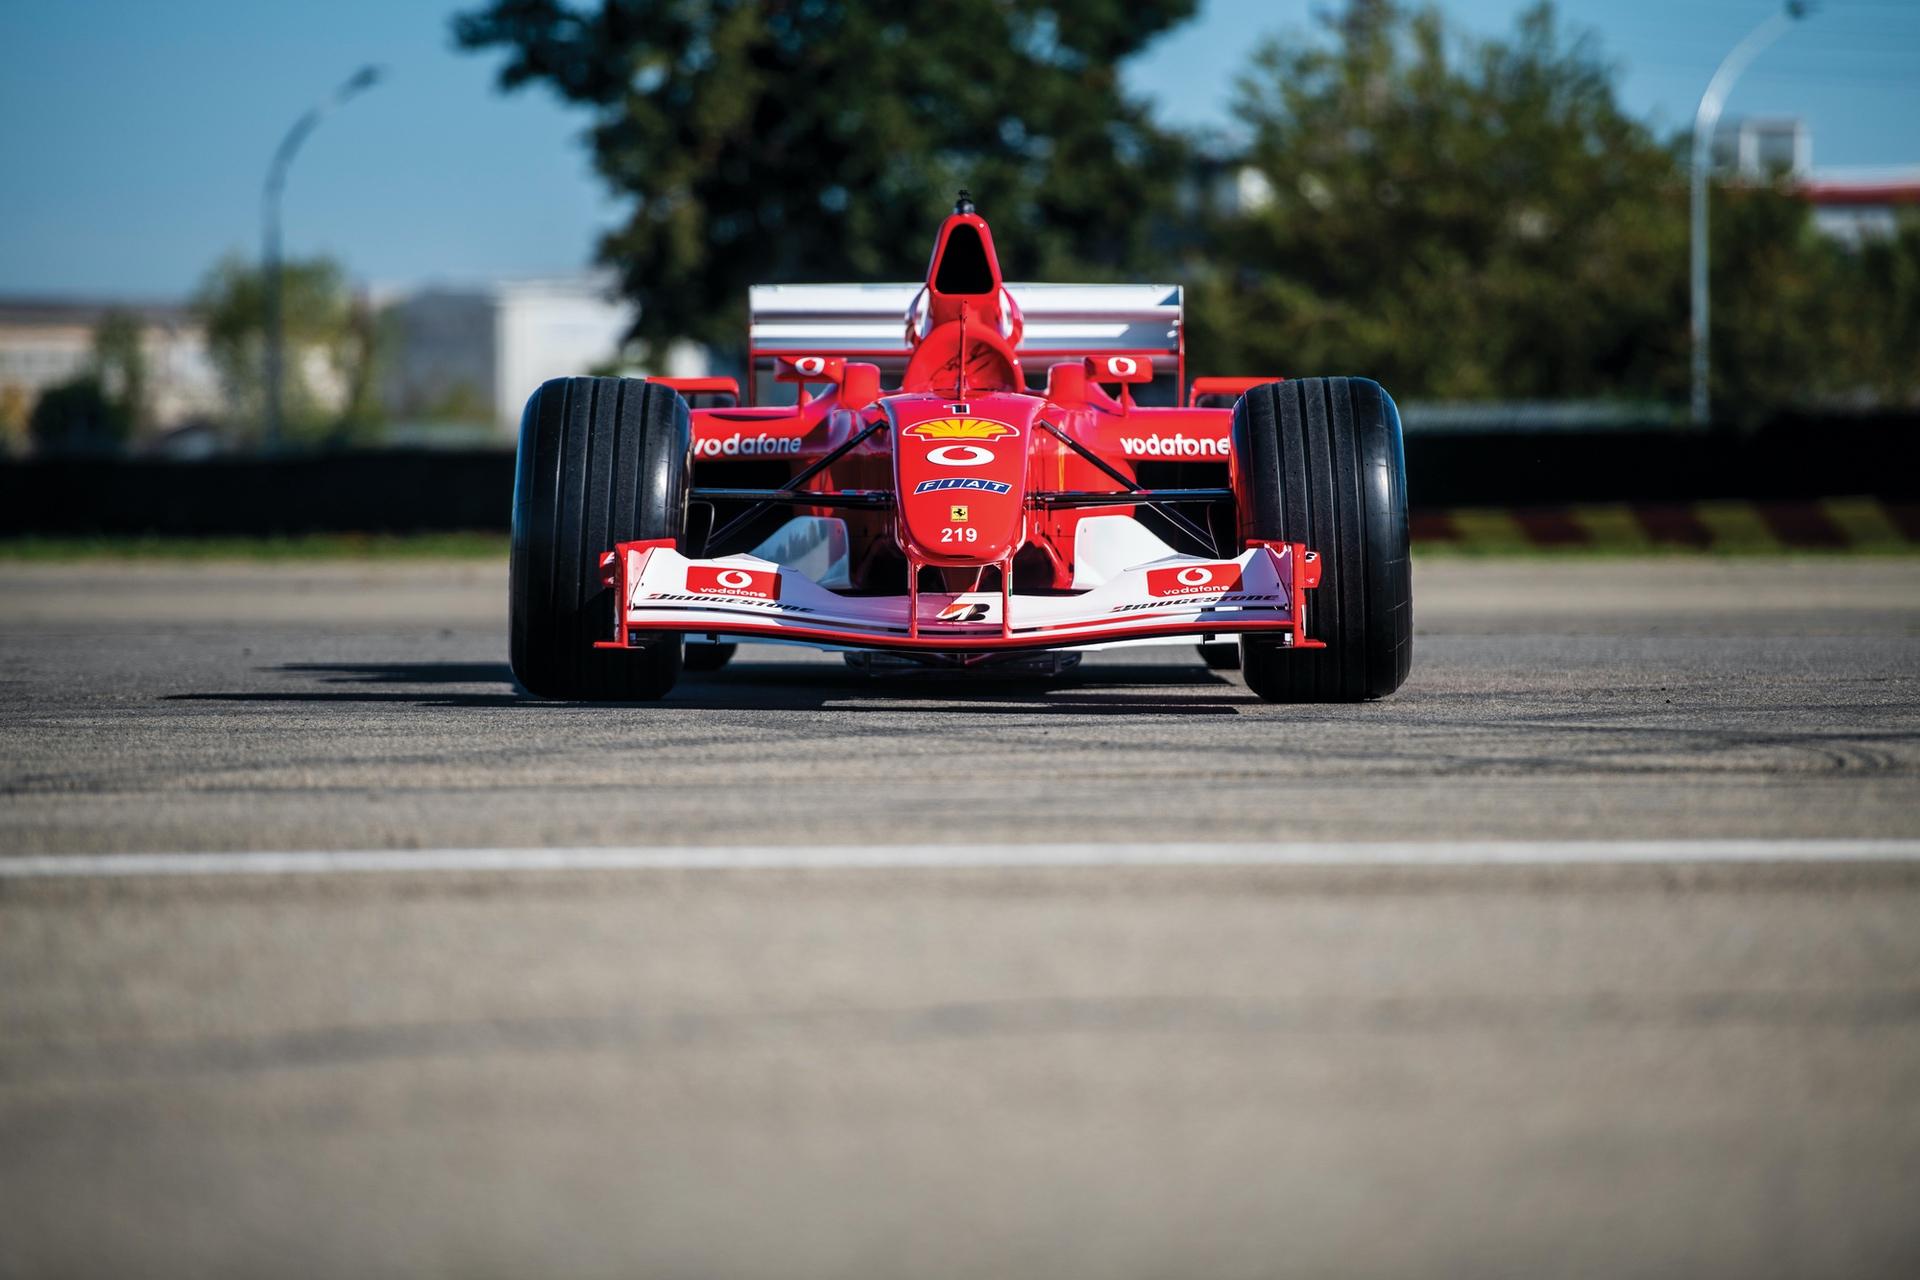 Mick_Schumacher_Ferrari_F2002_0004